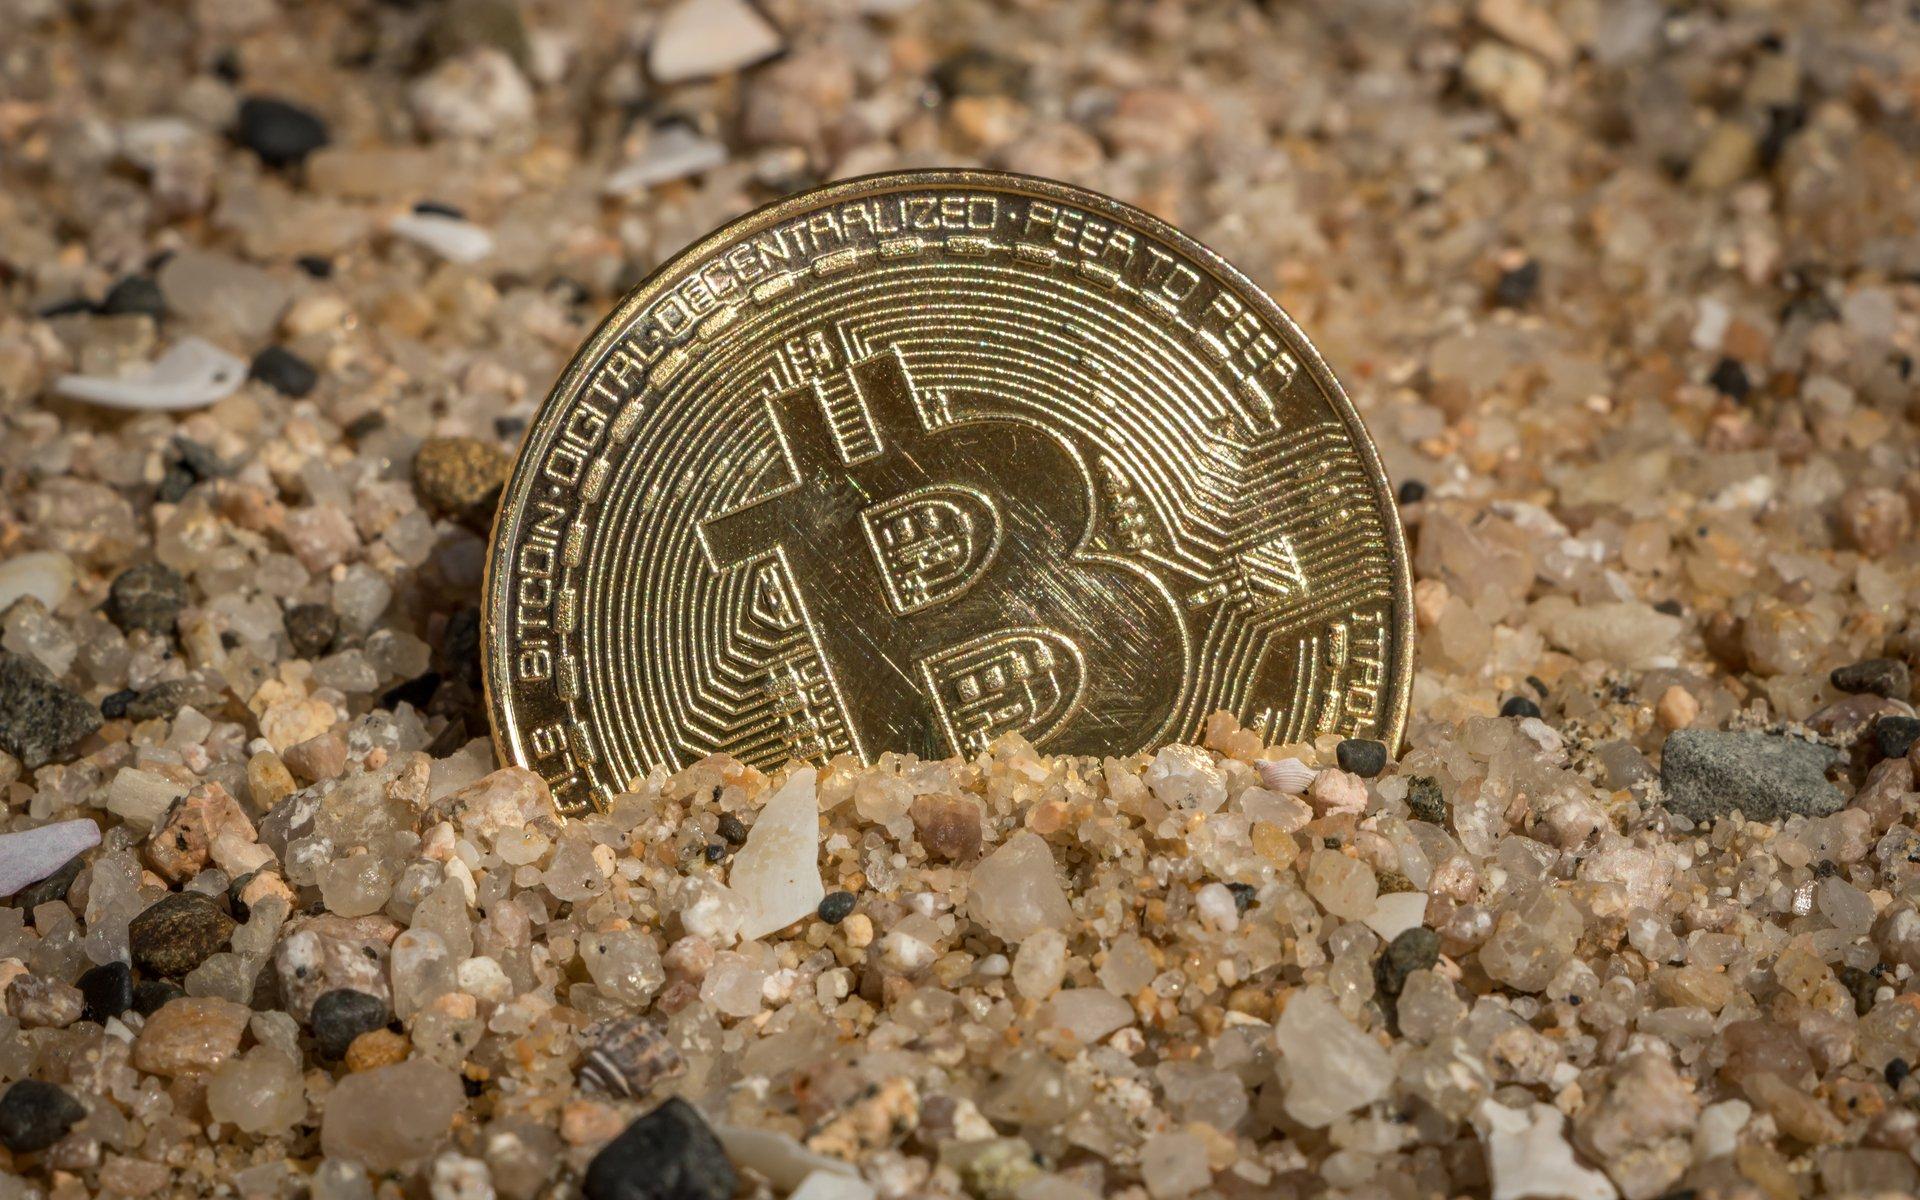 5 Ways Bitcoin Has Already Changed Money Forever